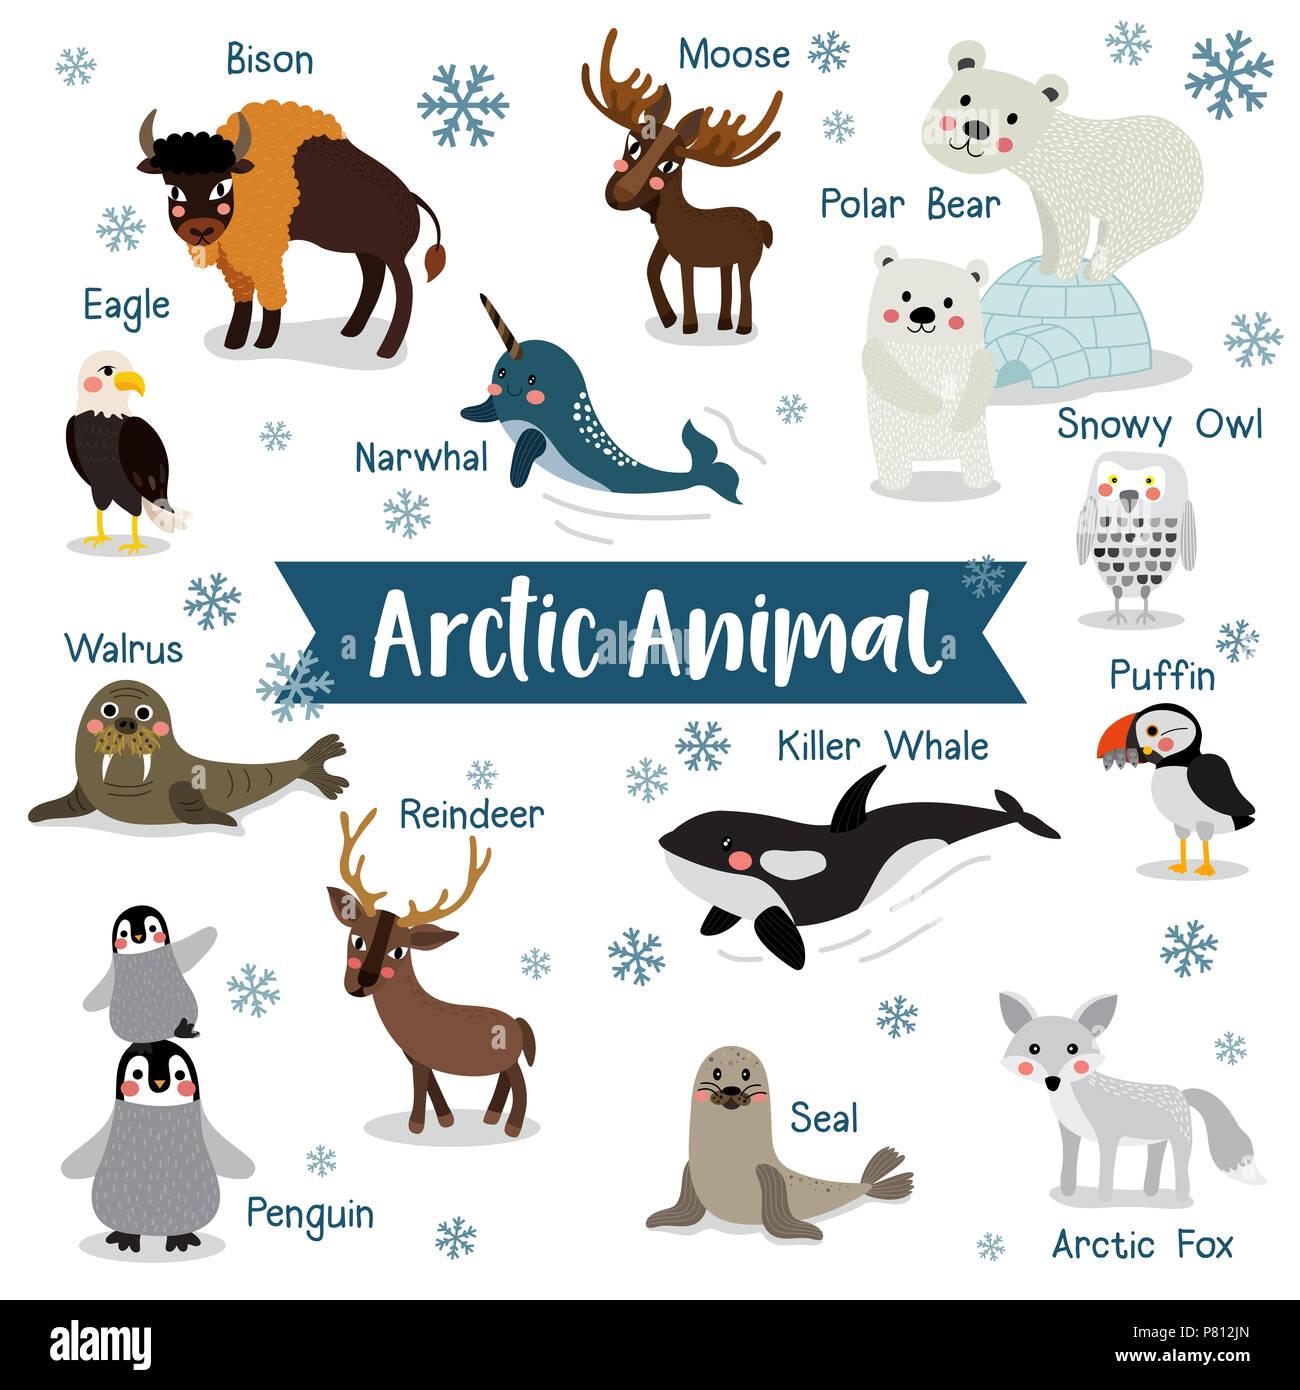 Arctic Animal cartoon on white background with animal name. Penguin, Polar Bear, Reindeer. Walrus. Moose. Snowy Owl. Arctic Fox. Eagle. Killer whale.  - Stock Image